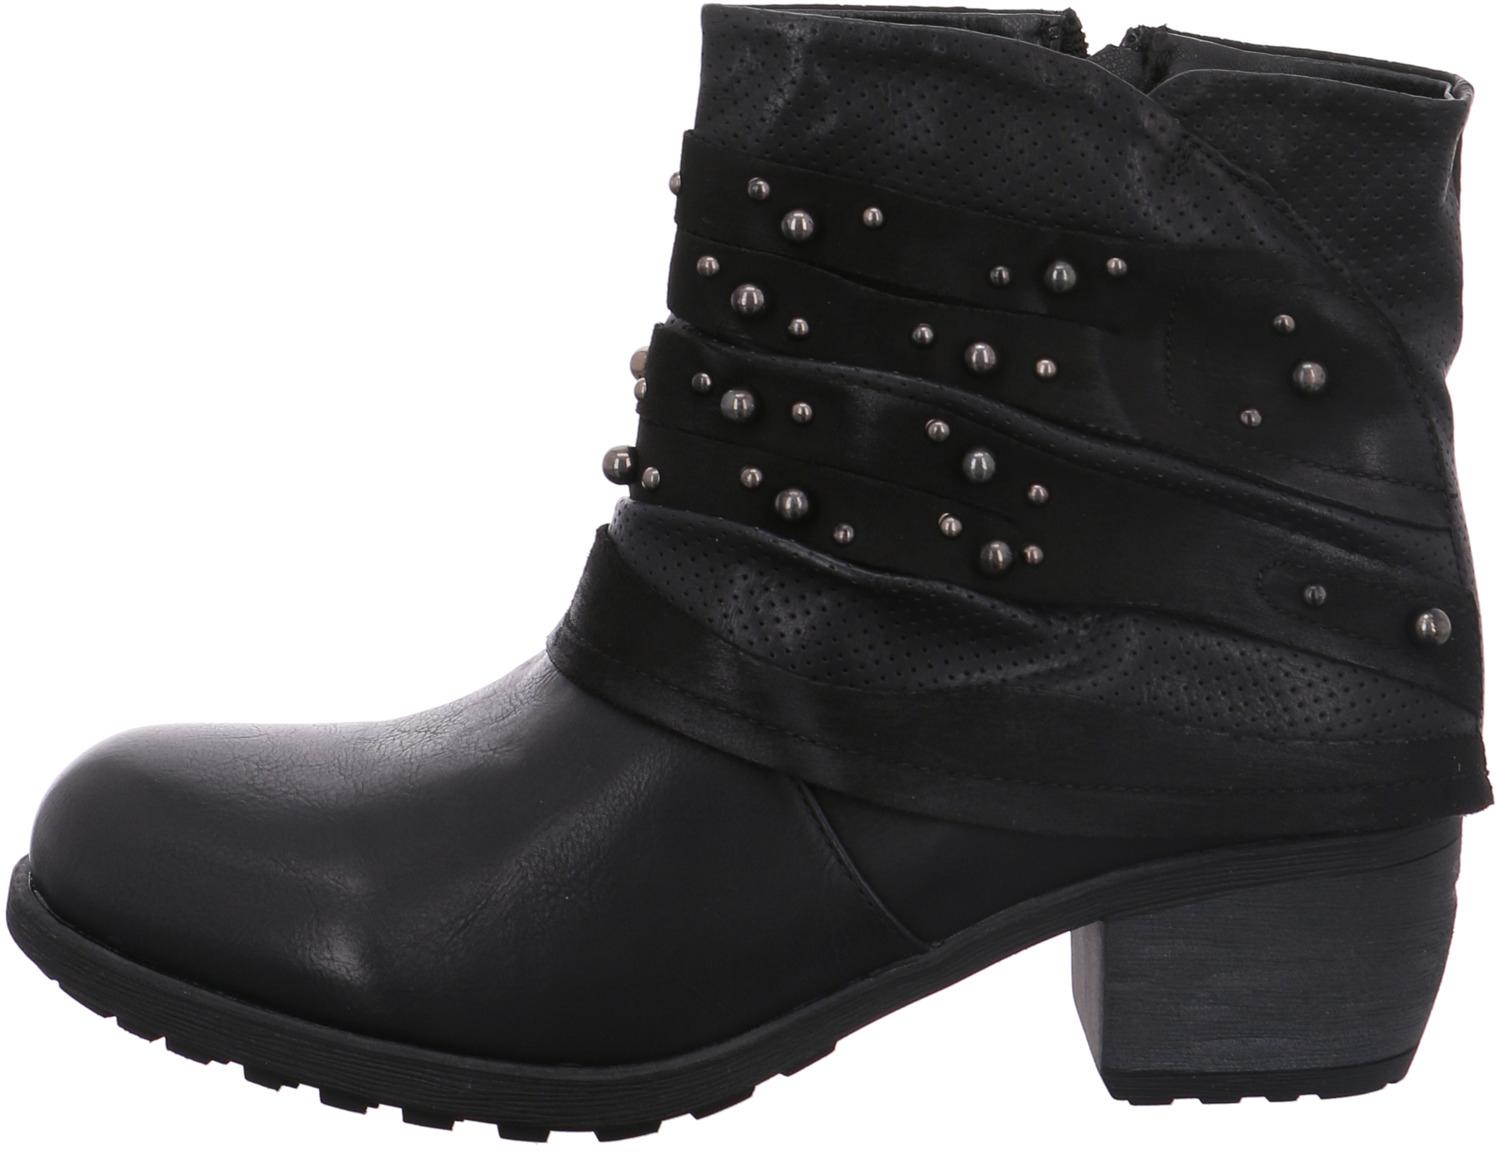 HW200902 Black